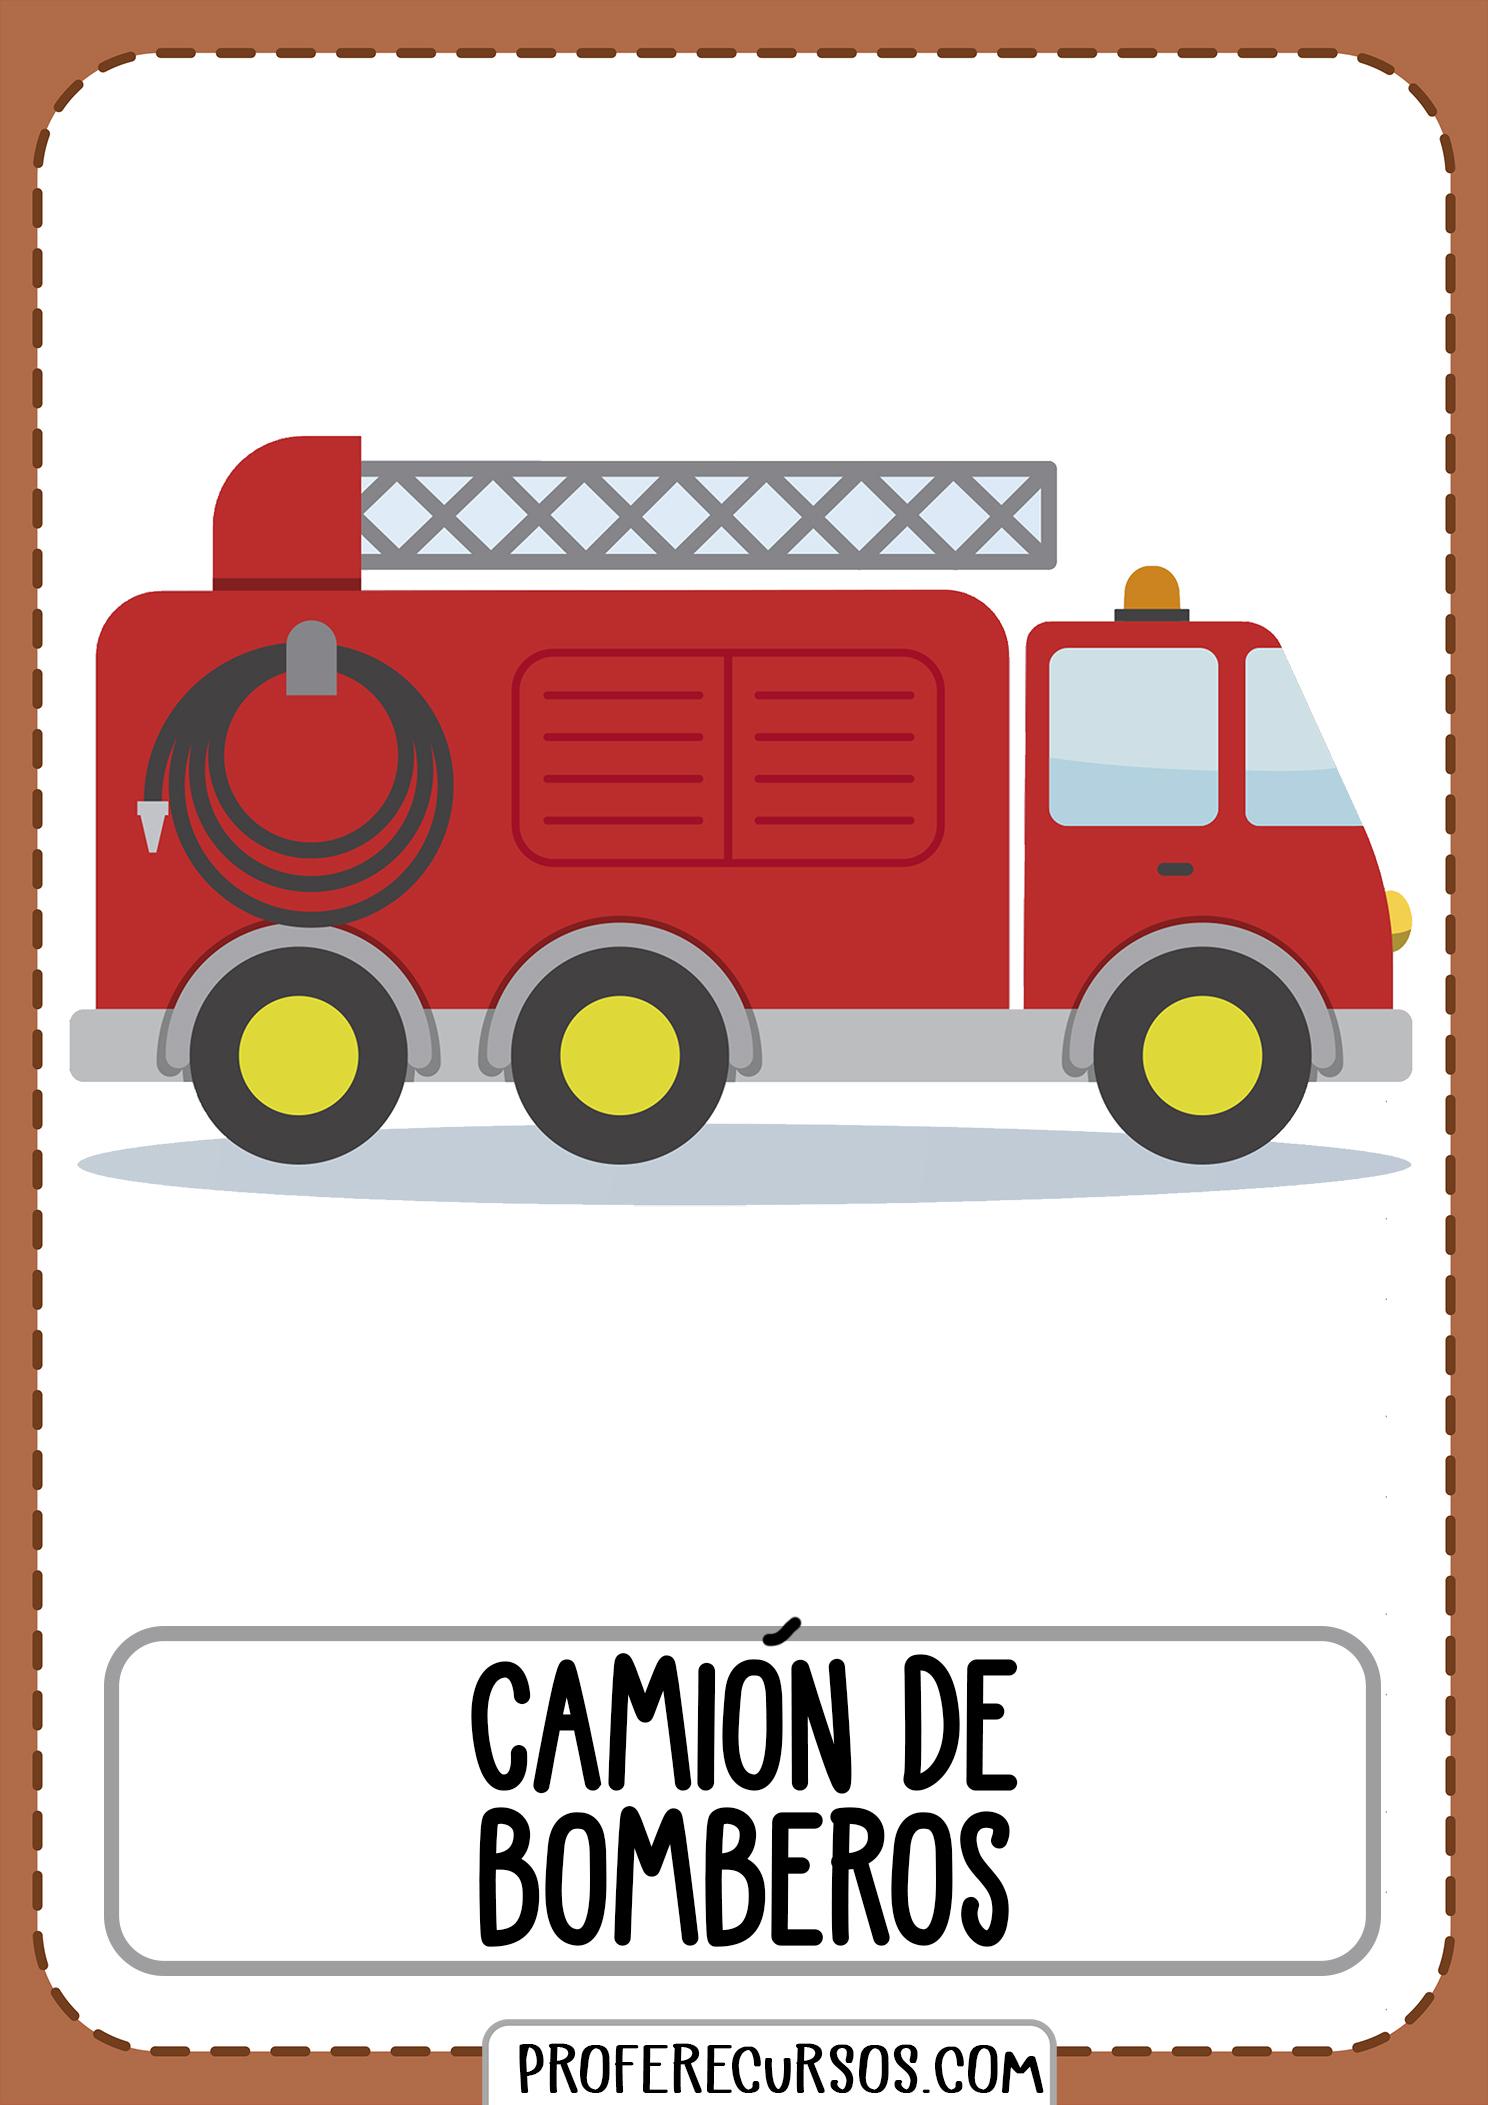 Tarjetas-vocabulario-medios-transporte-camion-bomberos